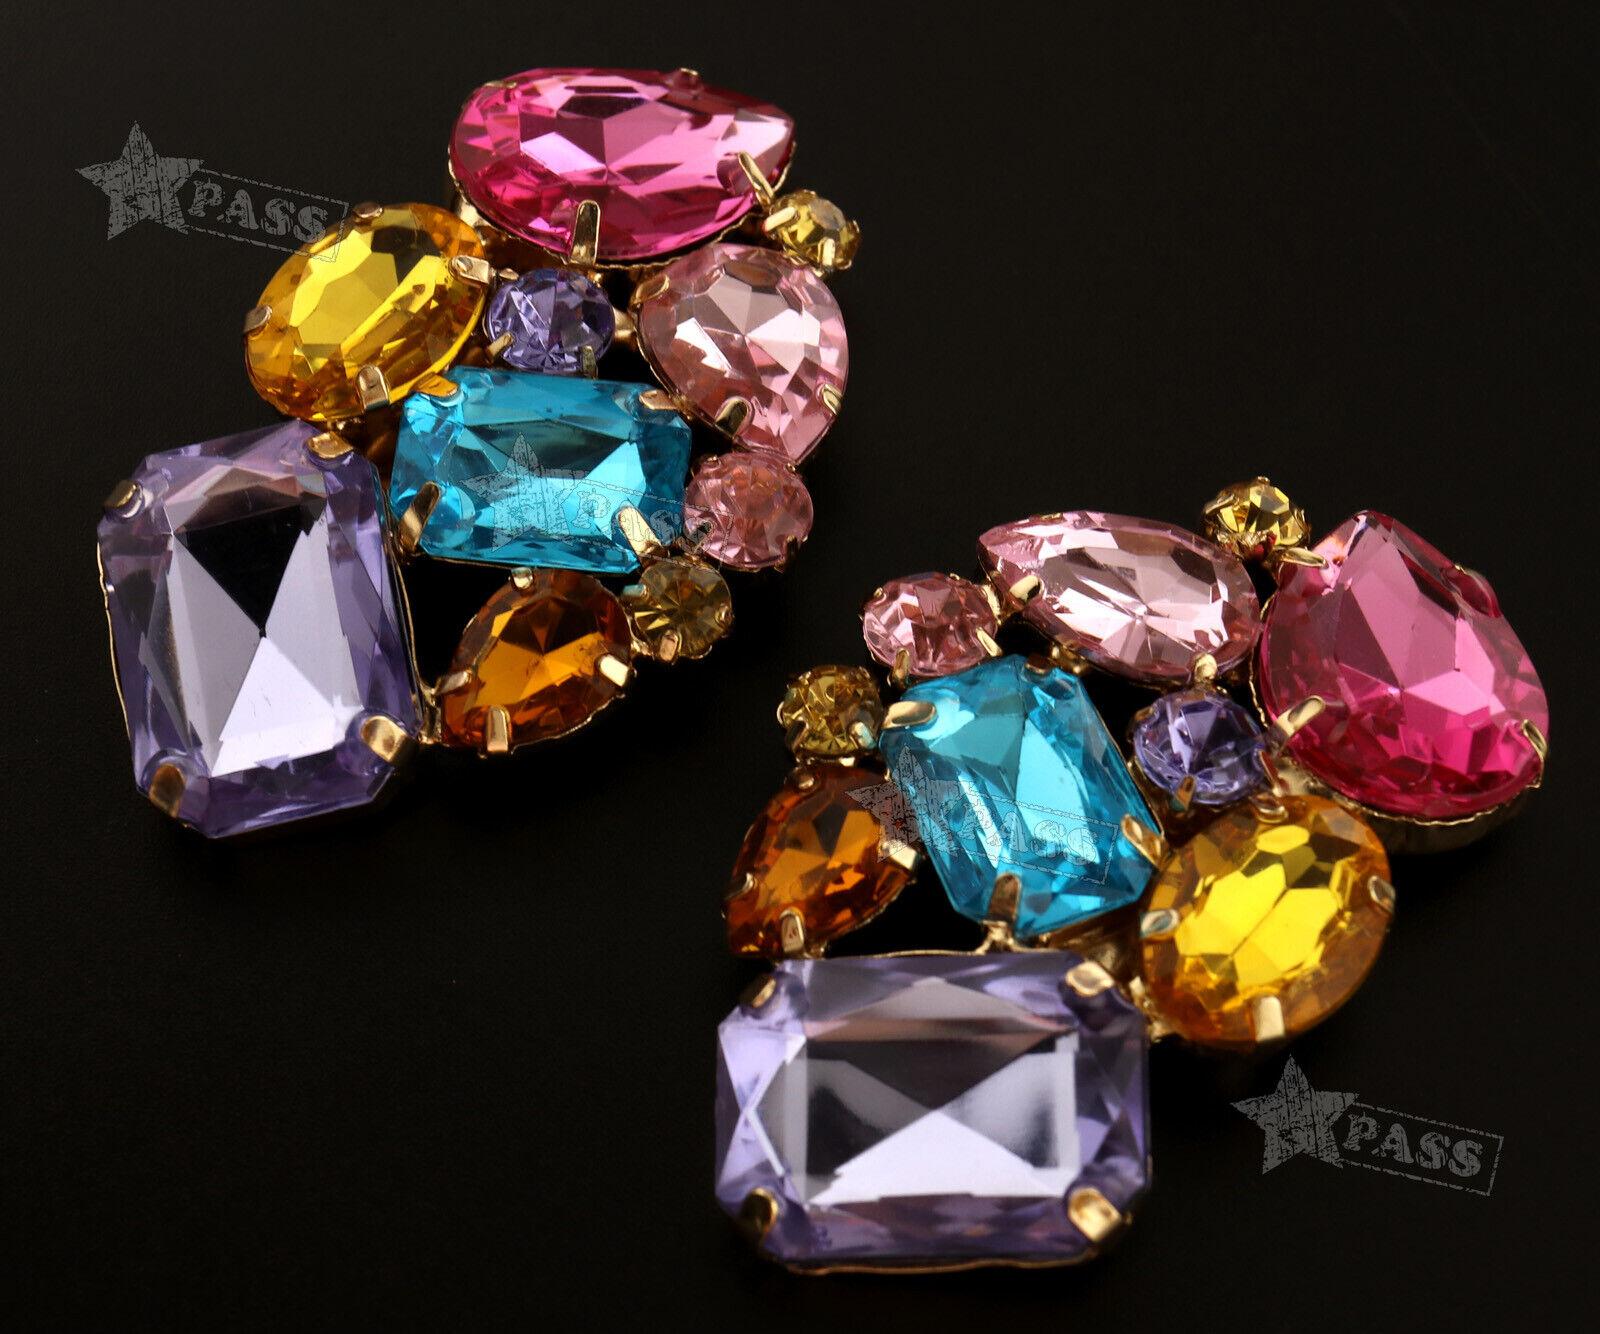 2Pcs Crystal Shoe Clips Charm Bridal Rhinestone Shoes Multicolor Decor